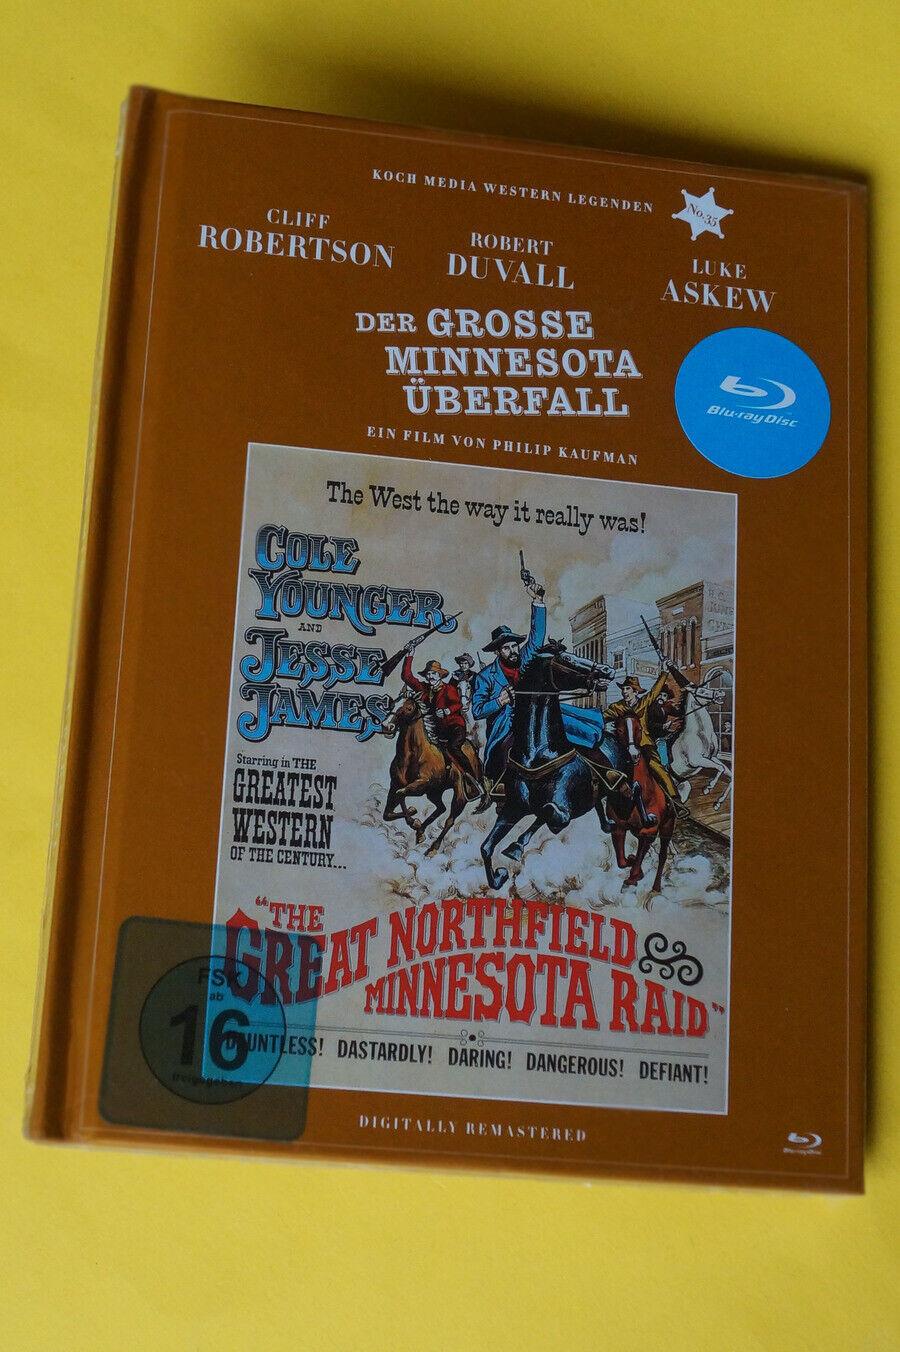 Der grosse Minnesota Überfall-Western Legenden No.35-Blu ray Mediabook-NEU/OVP